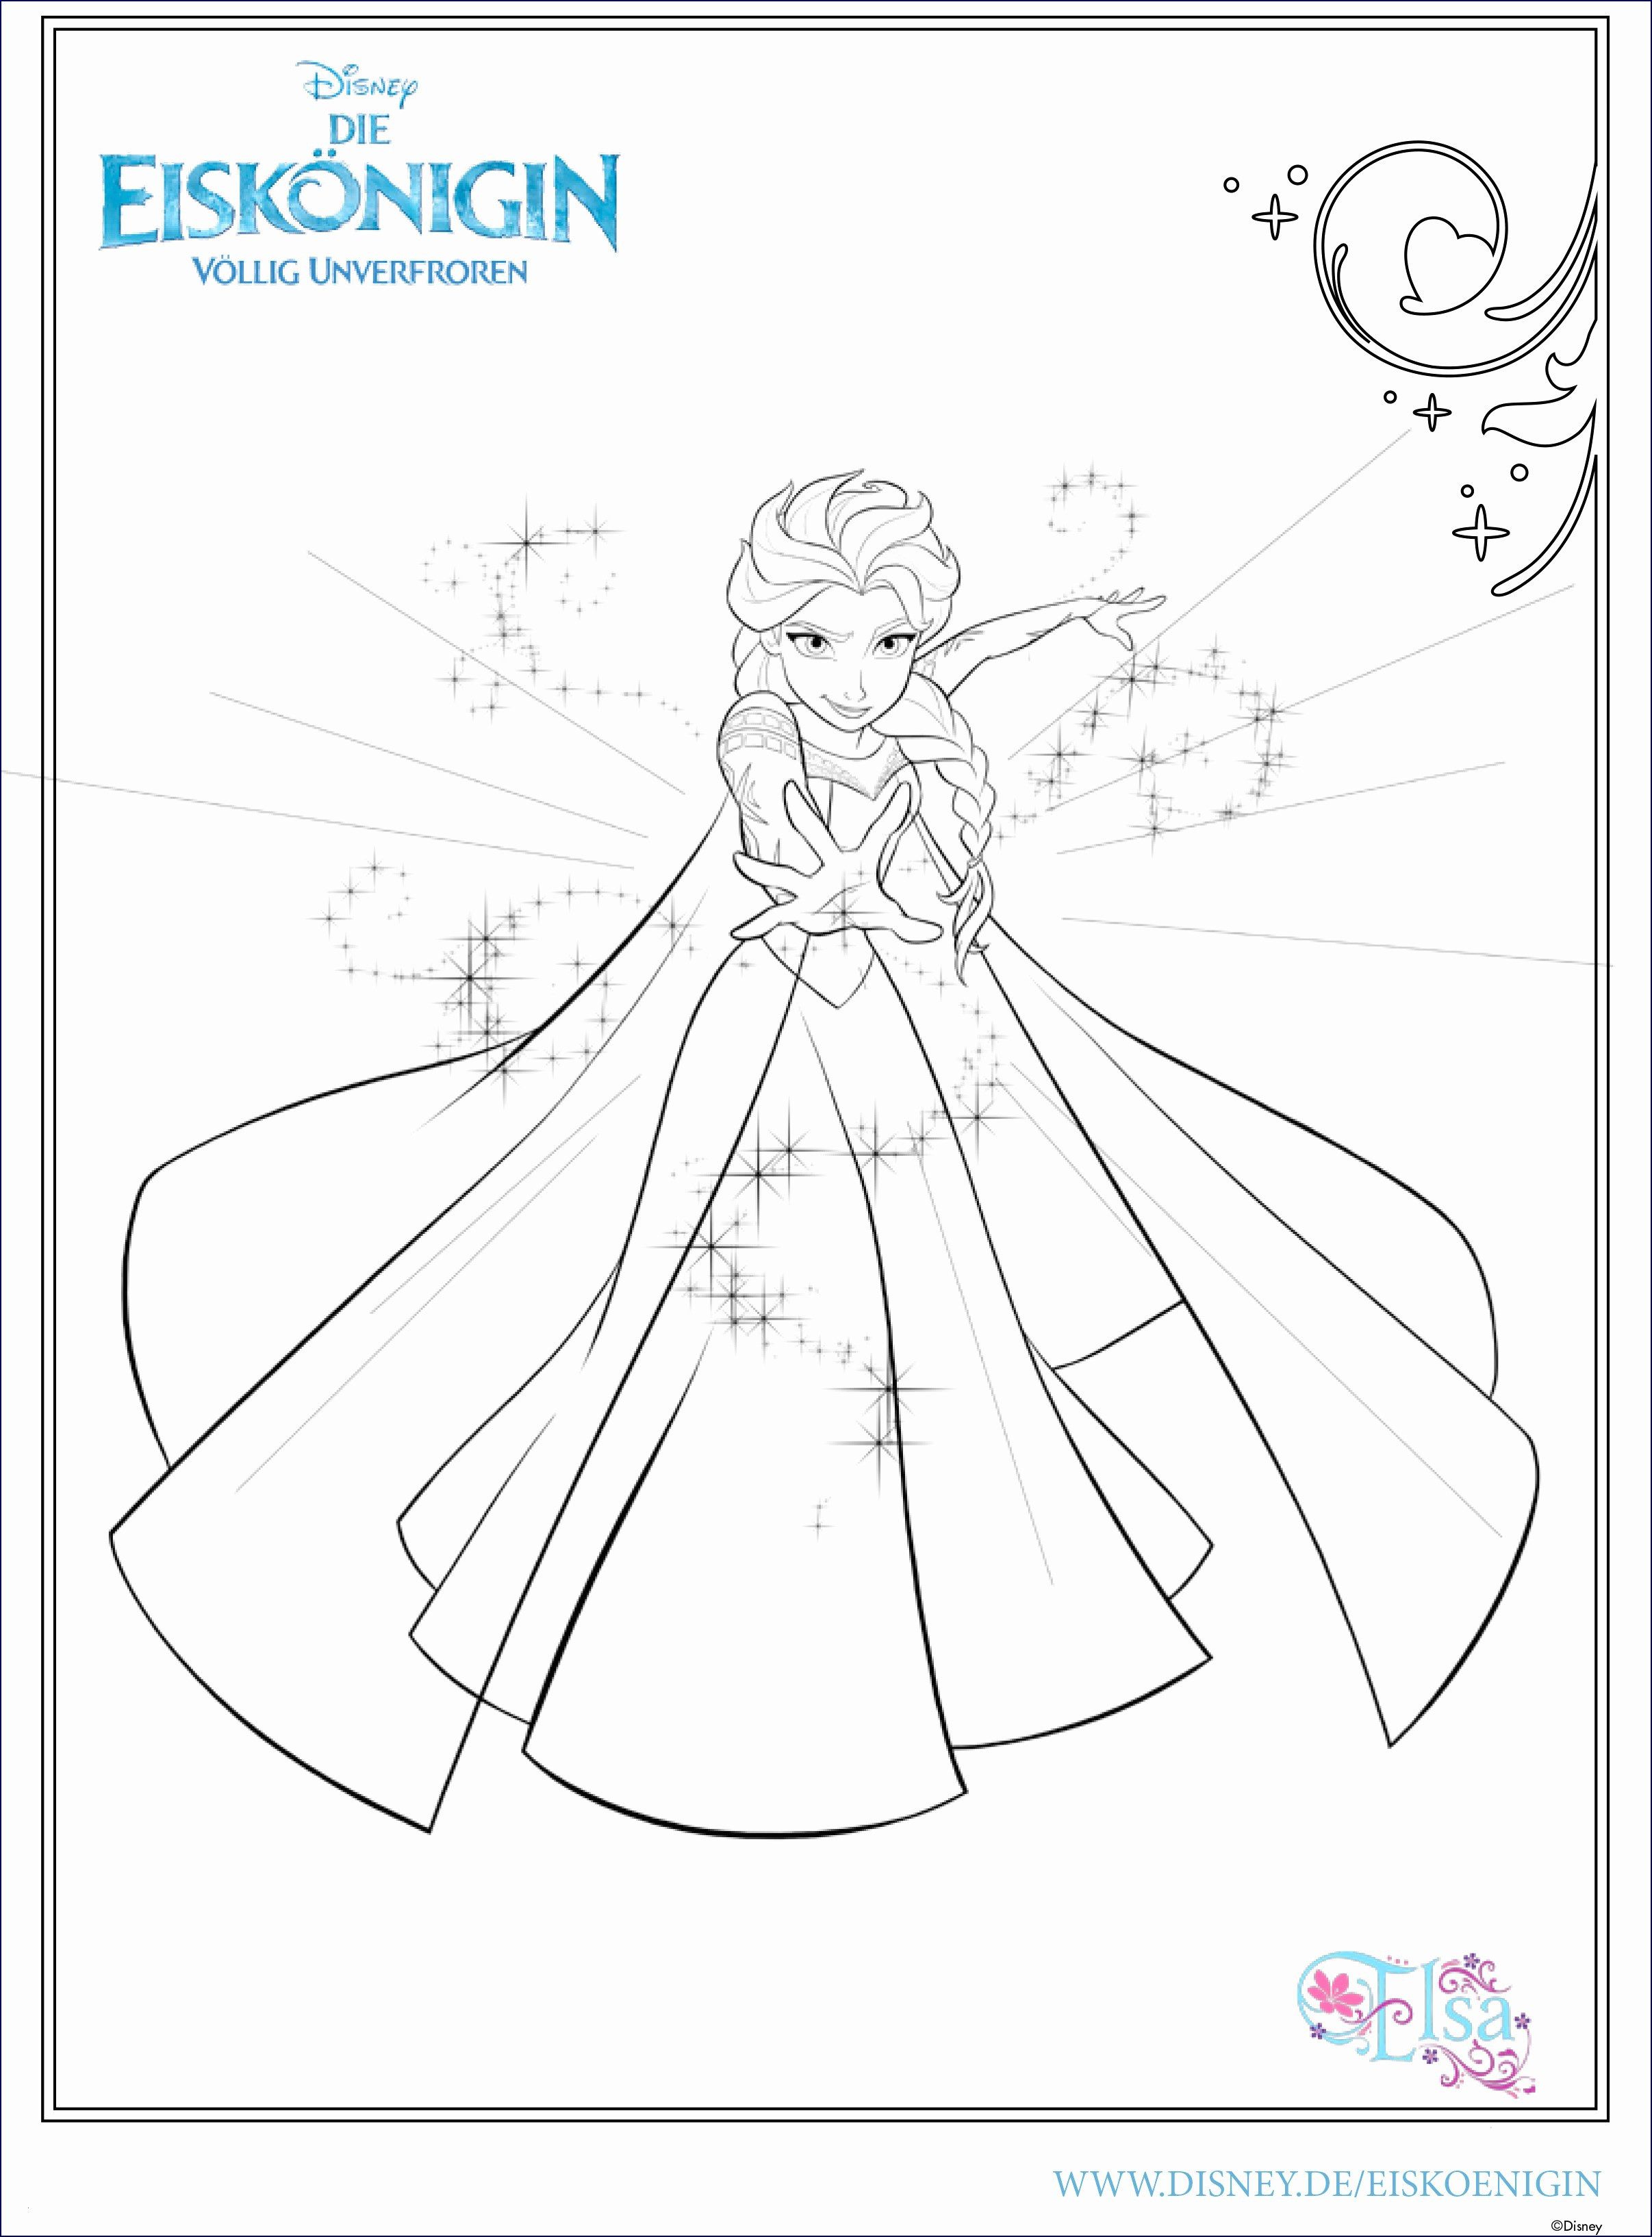 Malvorlagen Harry Potter Einzigartig 38 Elsa Frozen Ausmalbilder Scoredatscore Elegant Harry Potter Sammlung